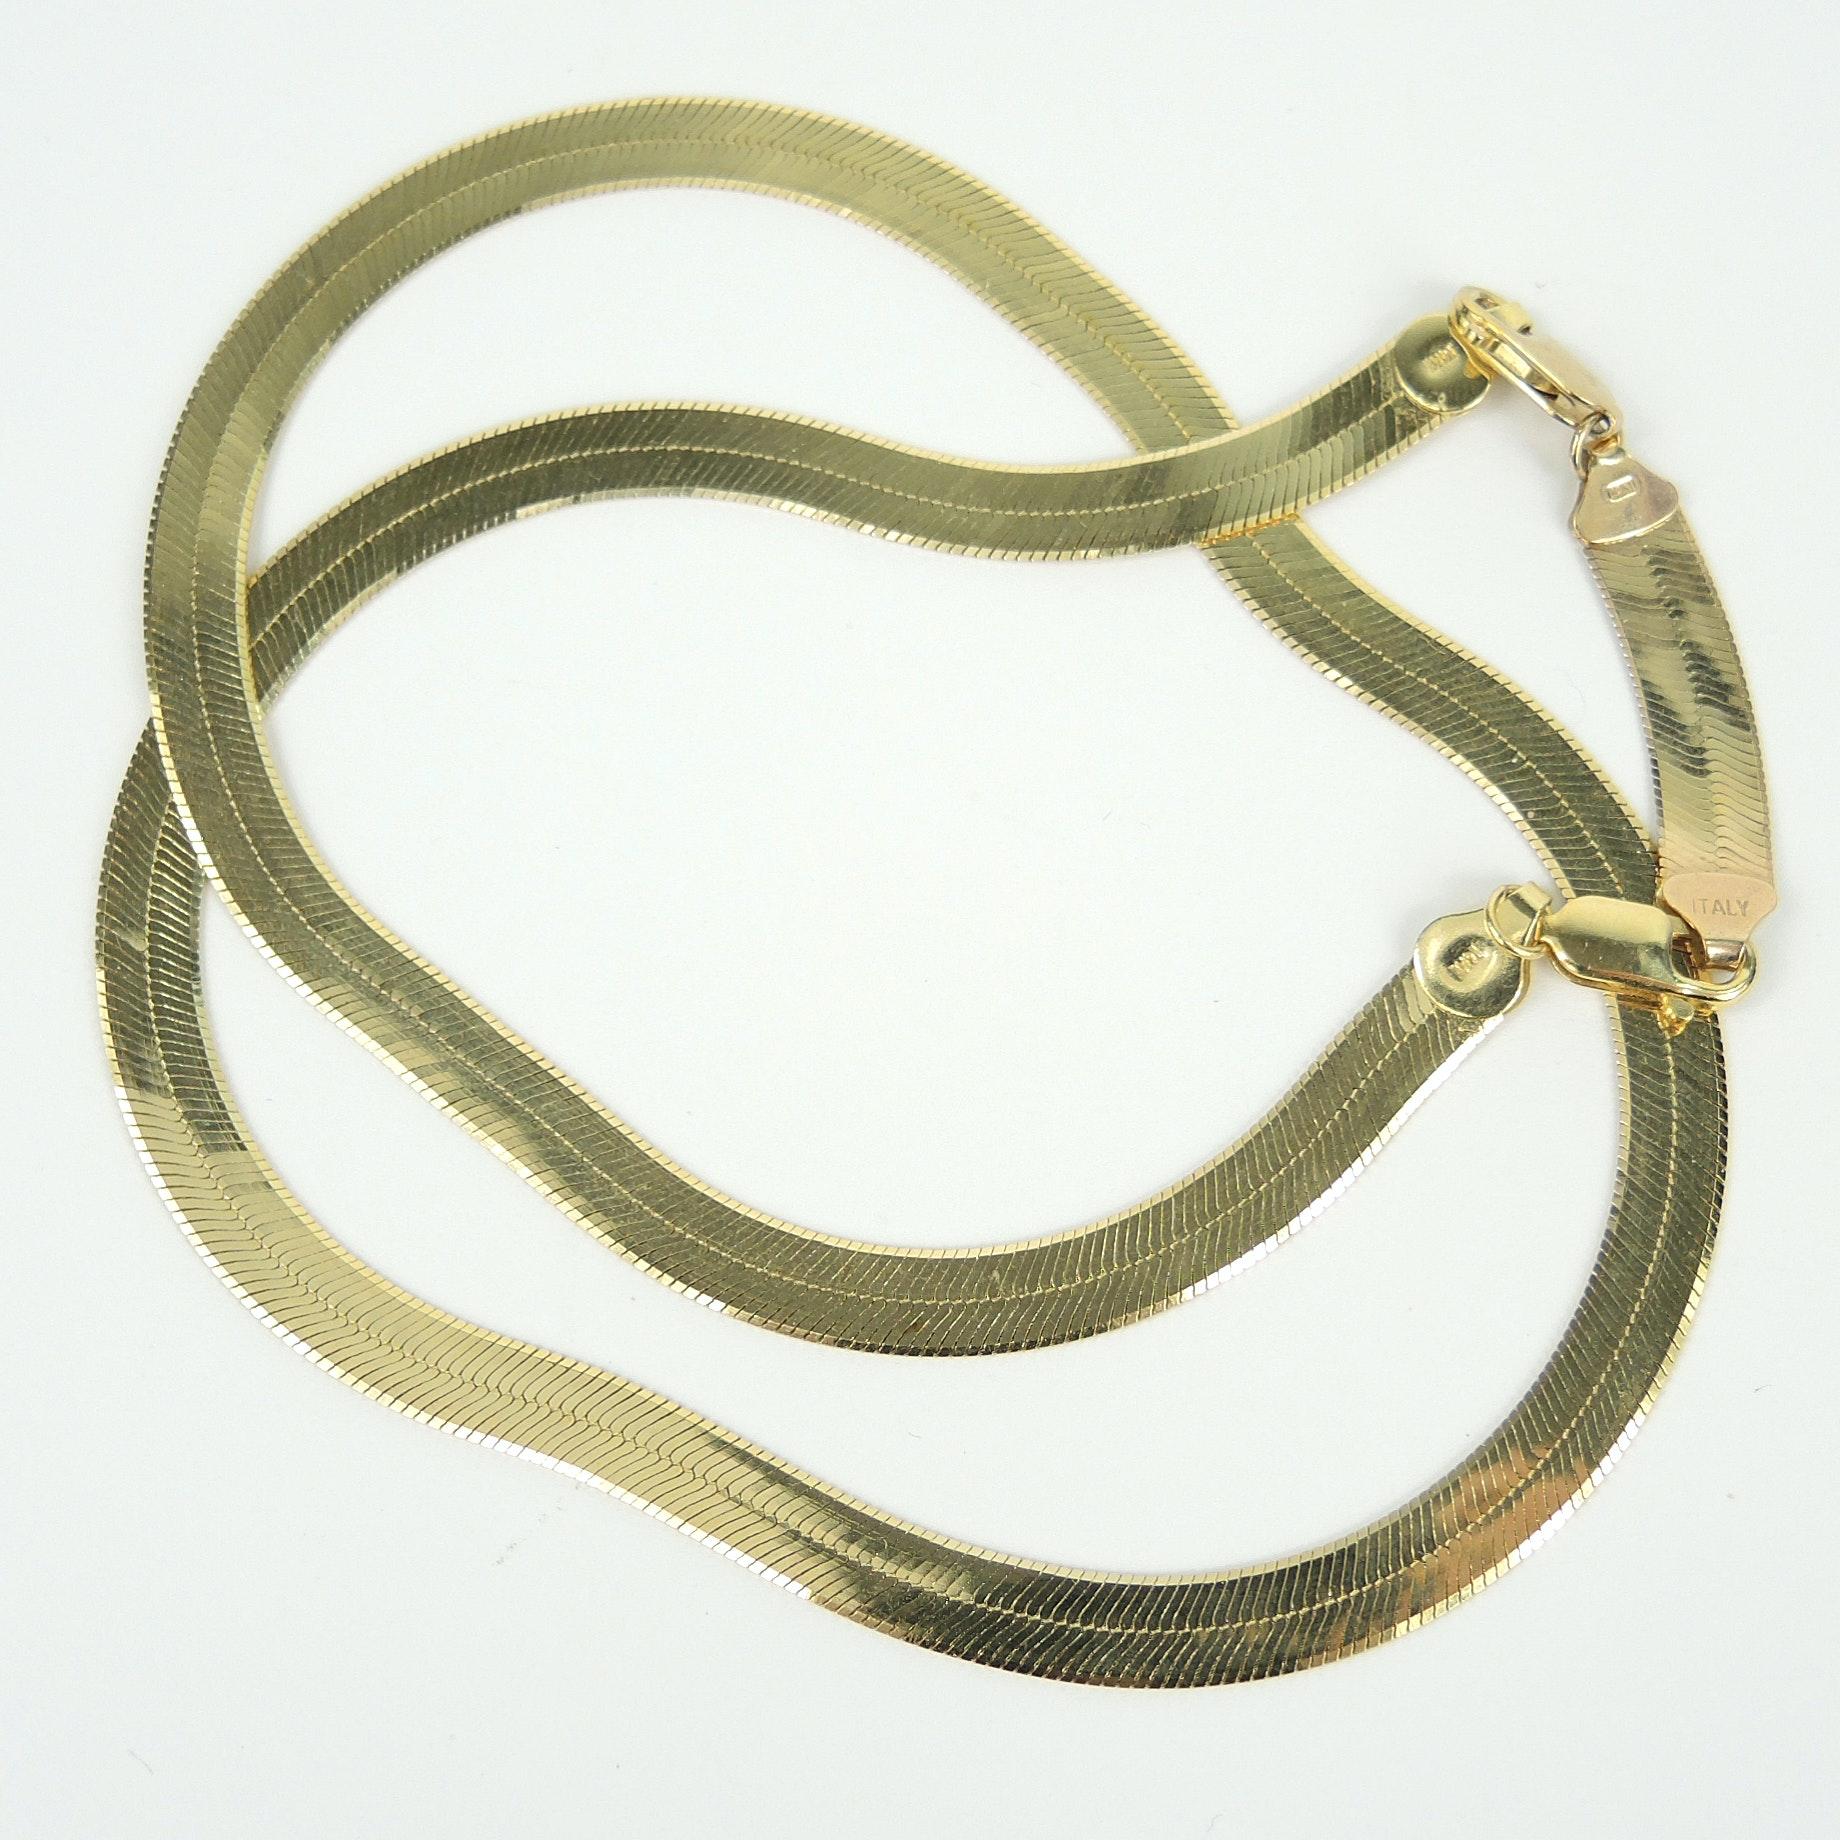 14K Italian Gold Herringbone Necklace with 10K Extender